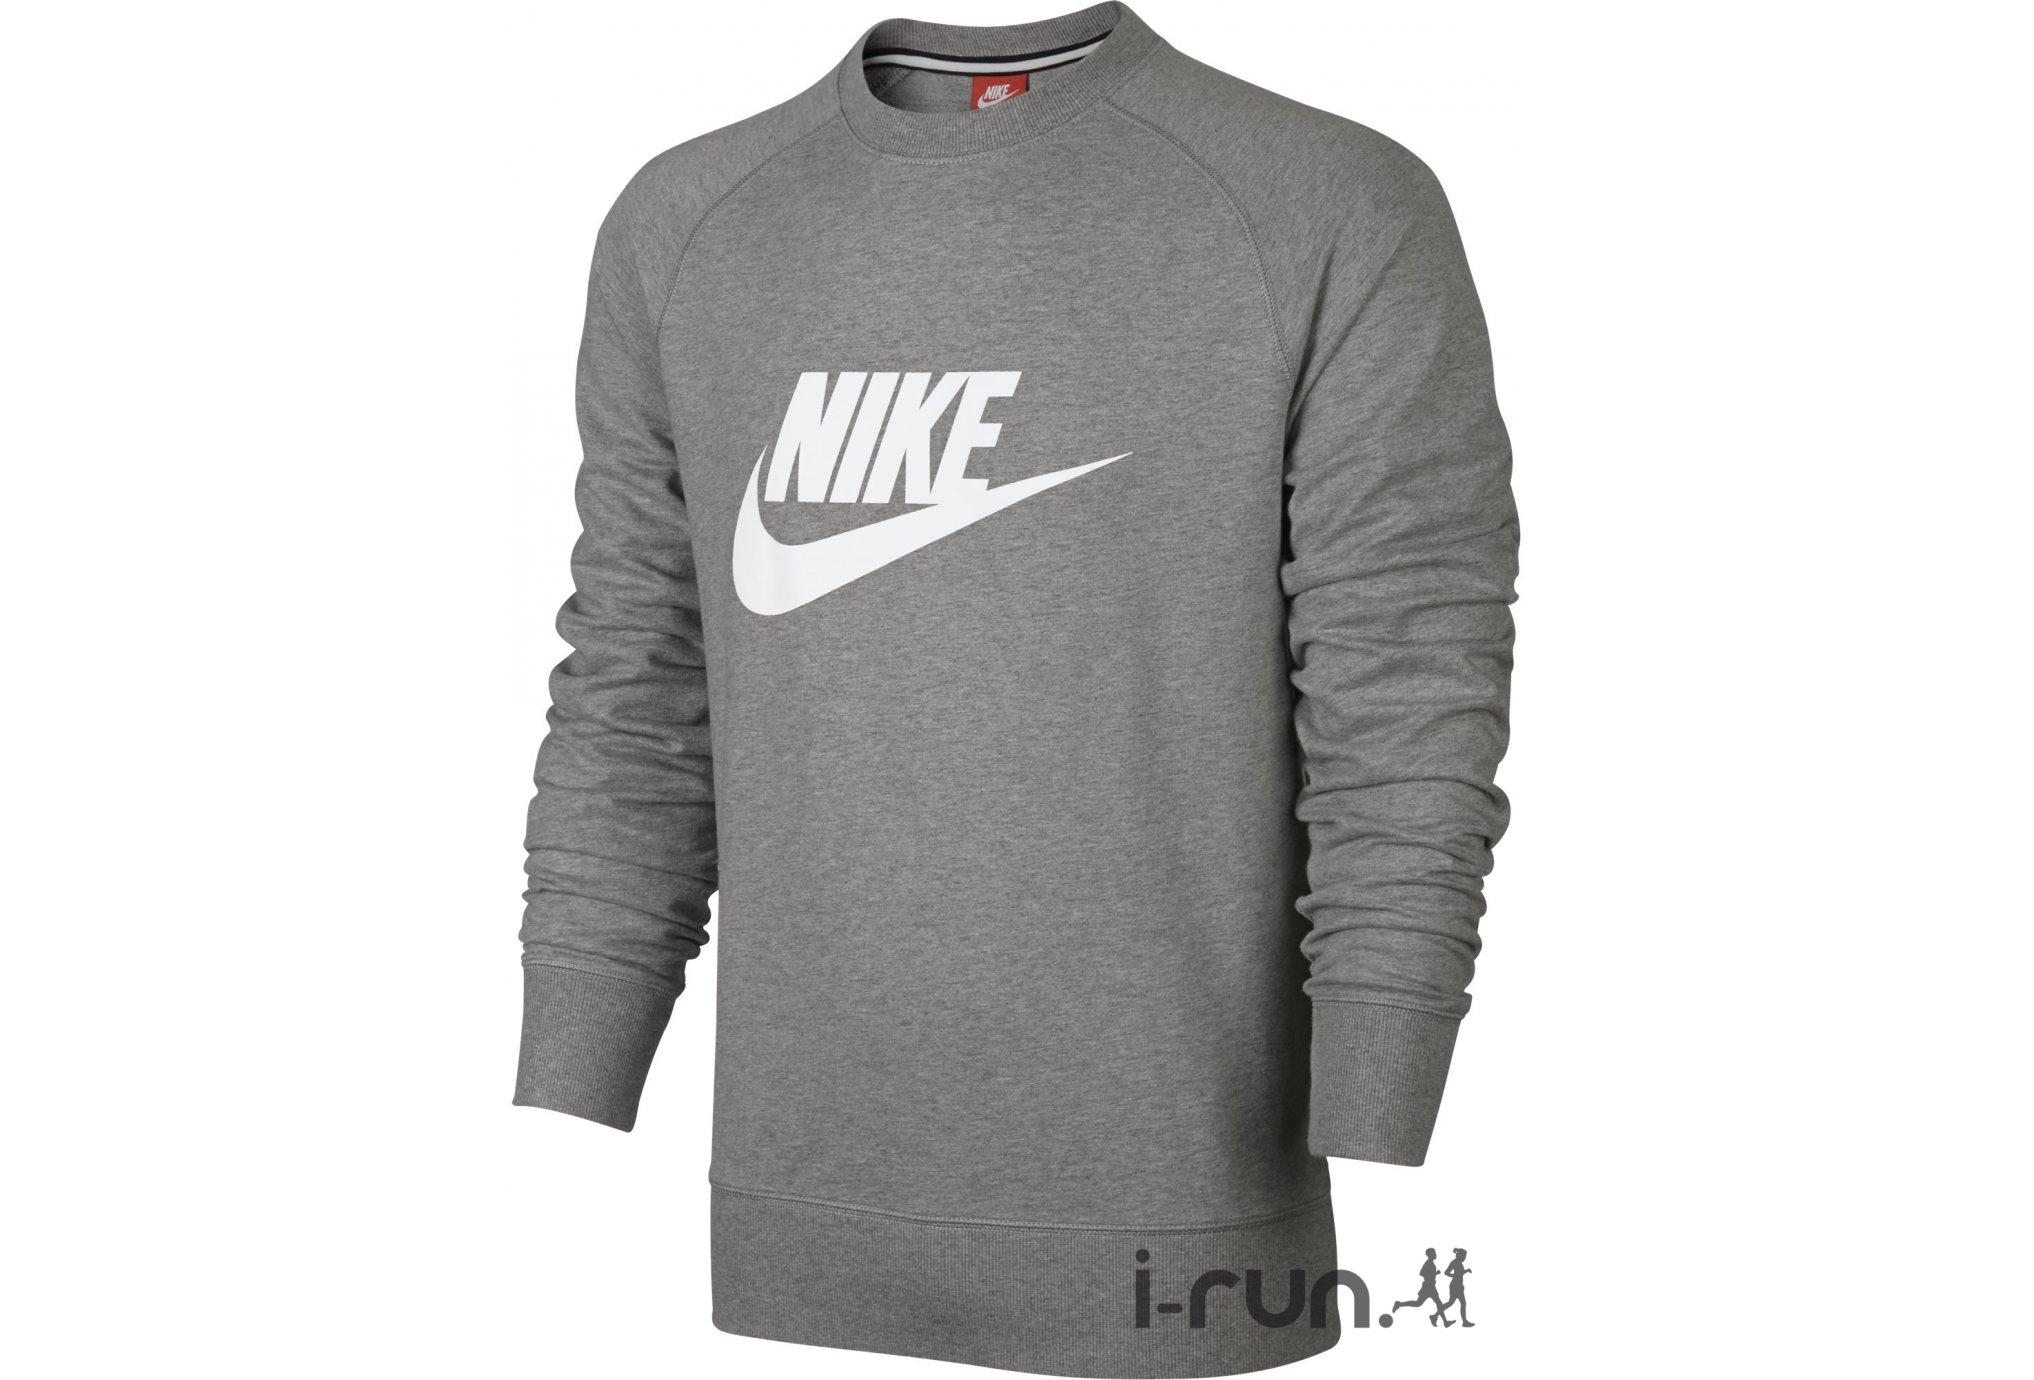 Nike Sweat AW77 Lightweight Solstice Crew M v�tement running homme